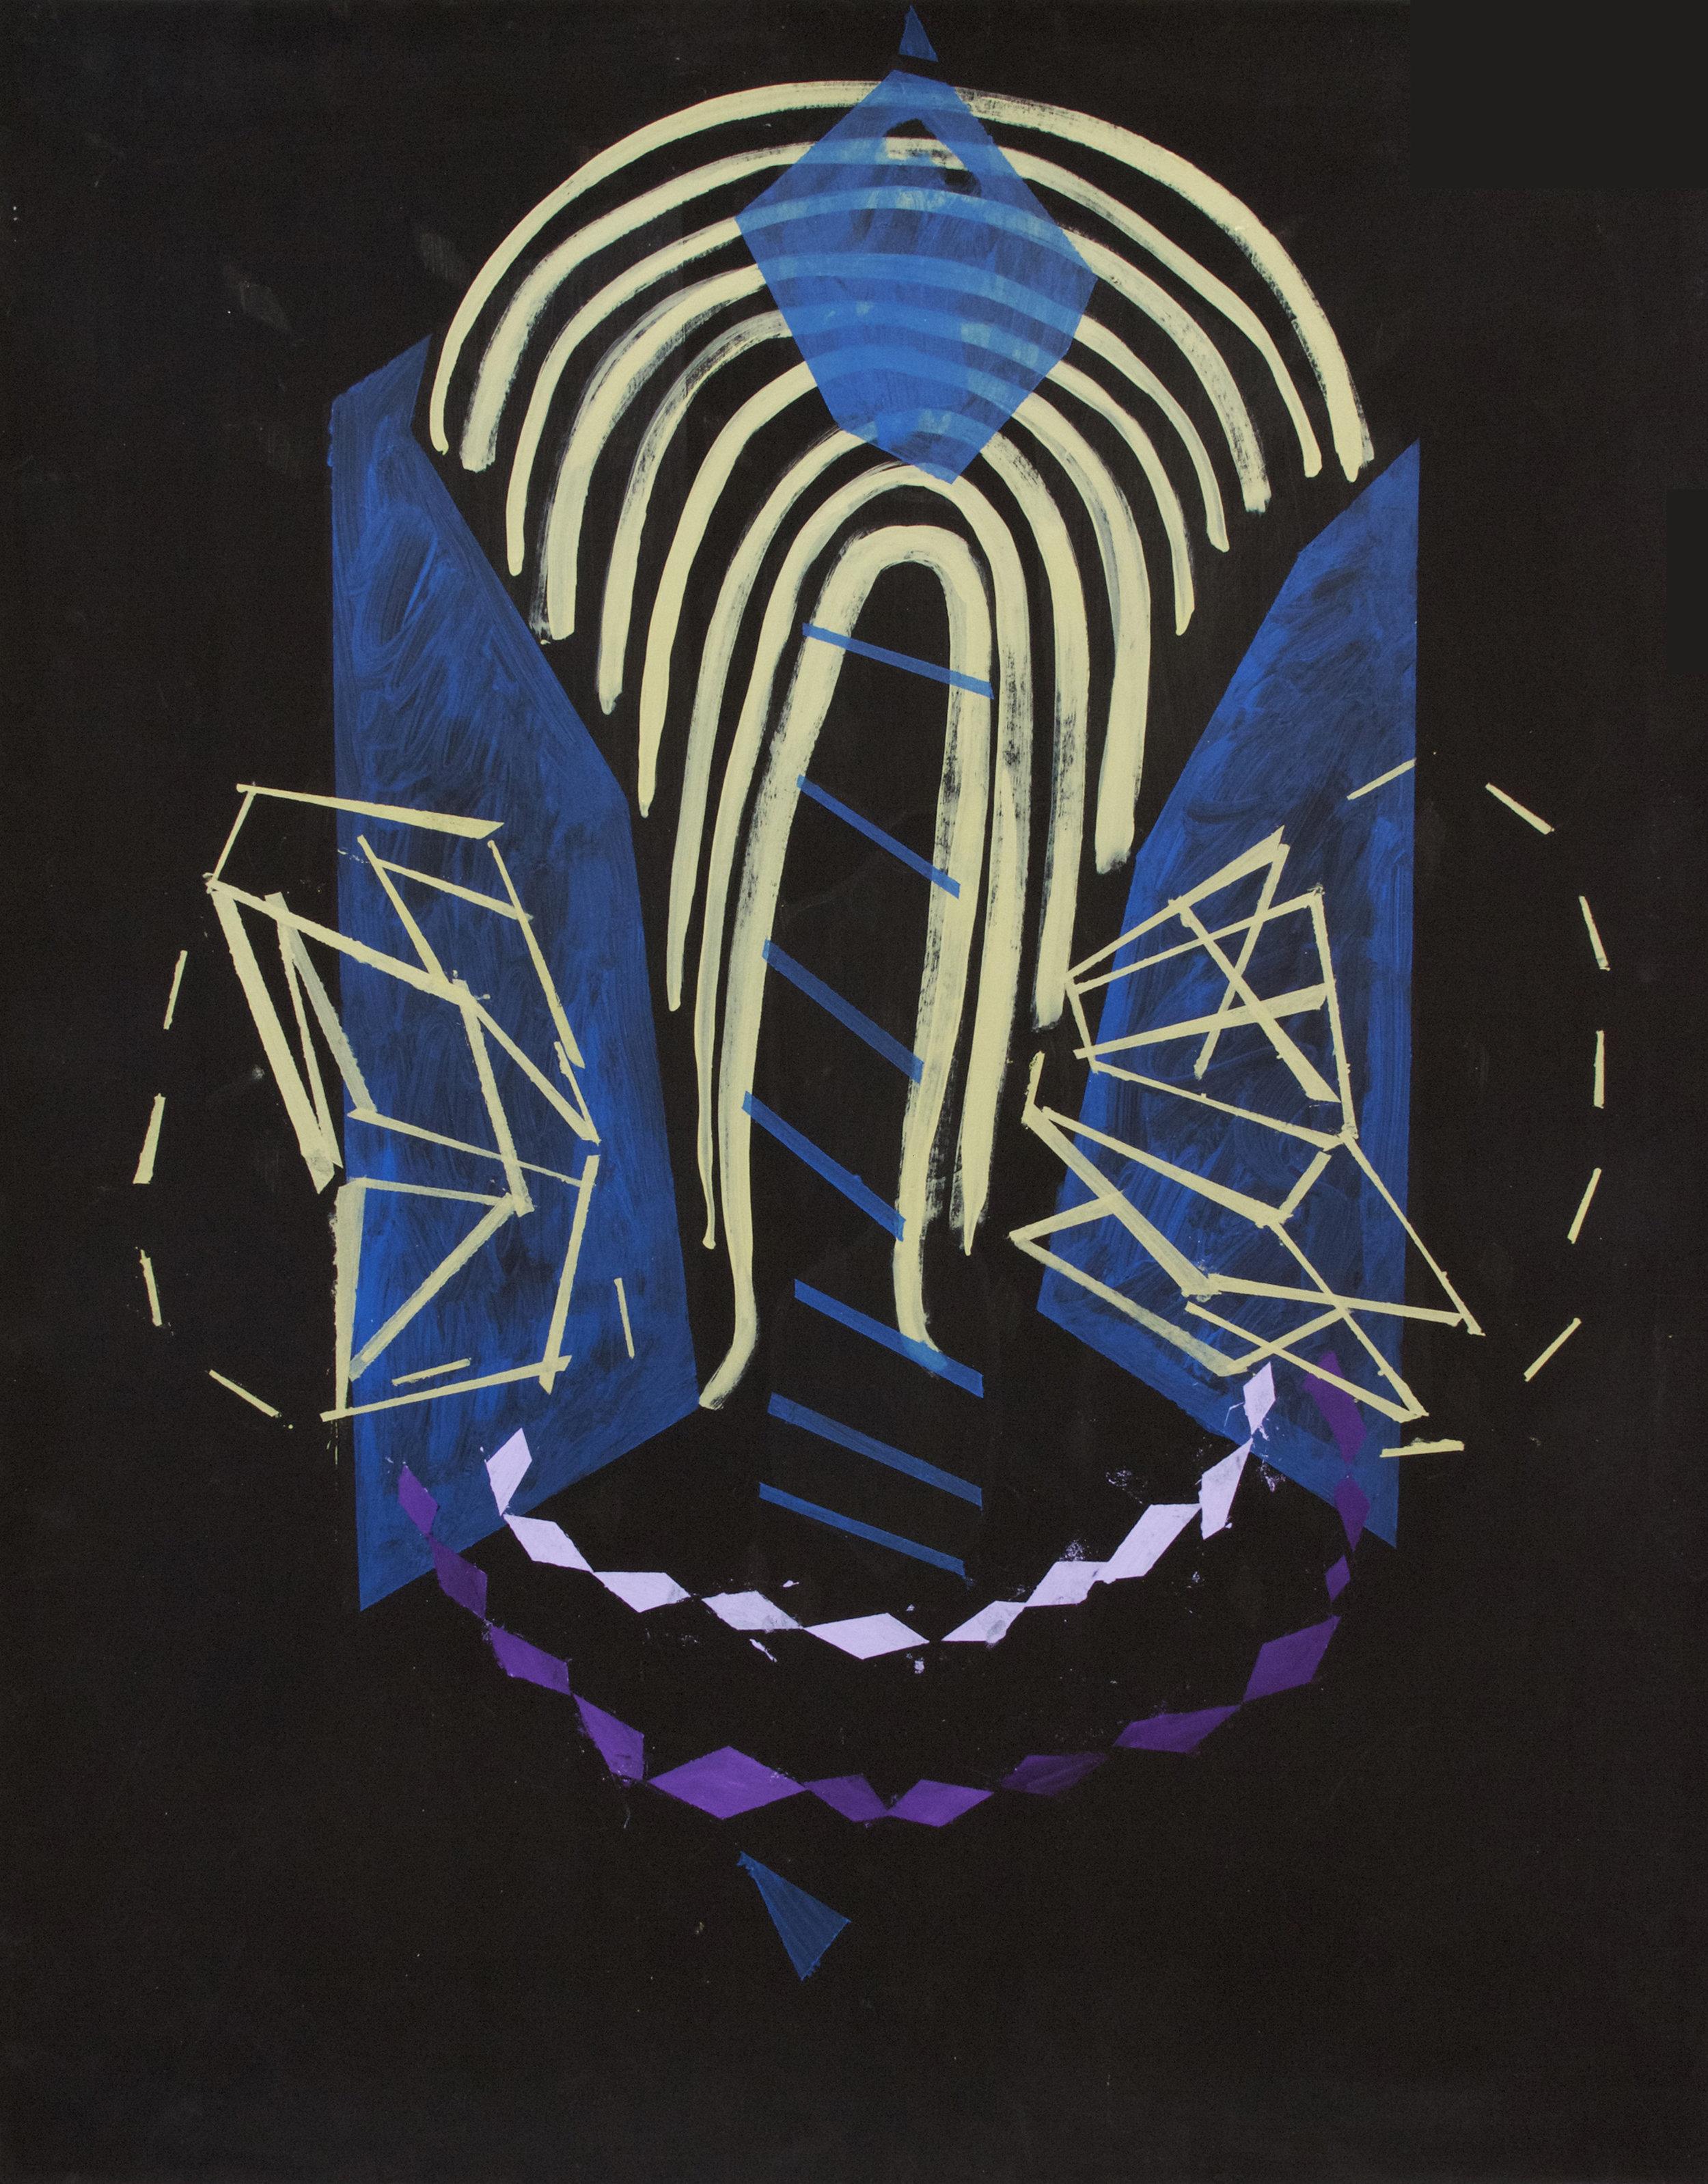 """Calling on Octavia pt. 1"" by  Caroline Kent"